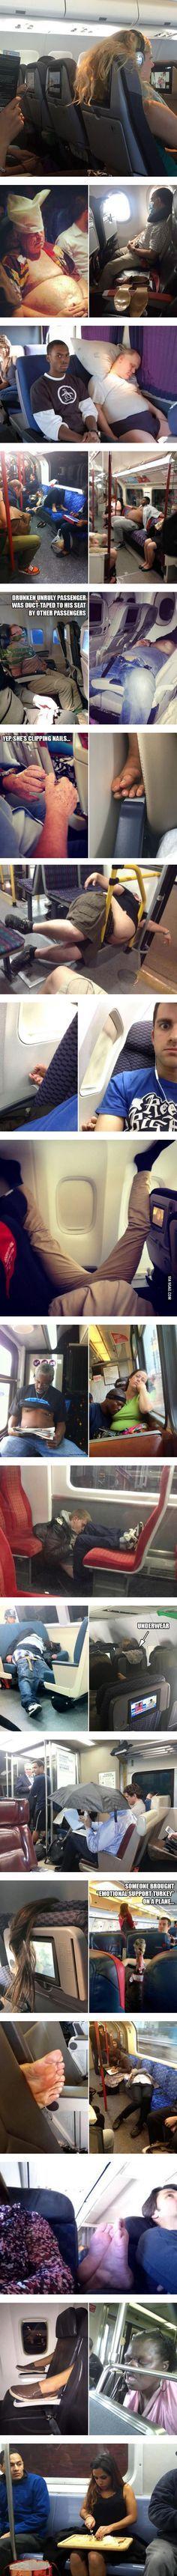 Passengers You DO NOT Want Sitting Near You - 9GAG